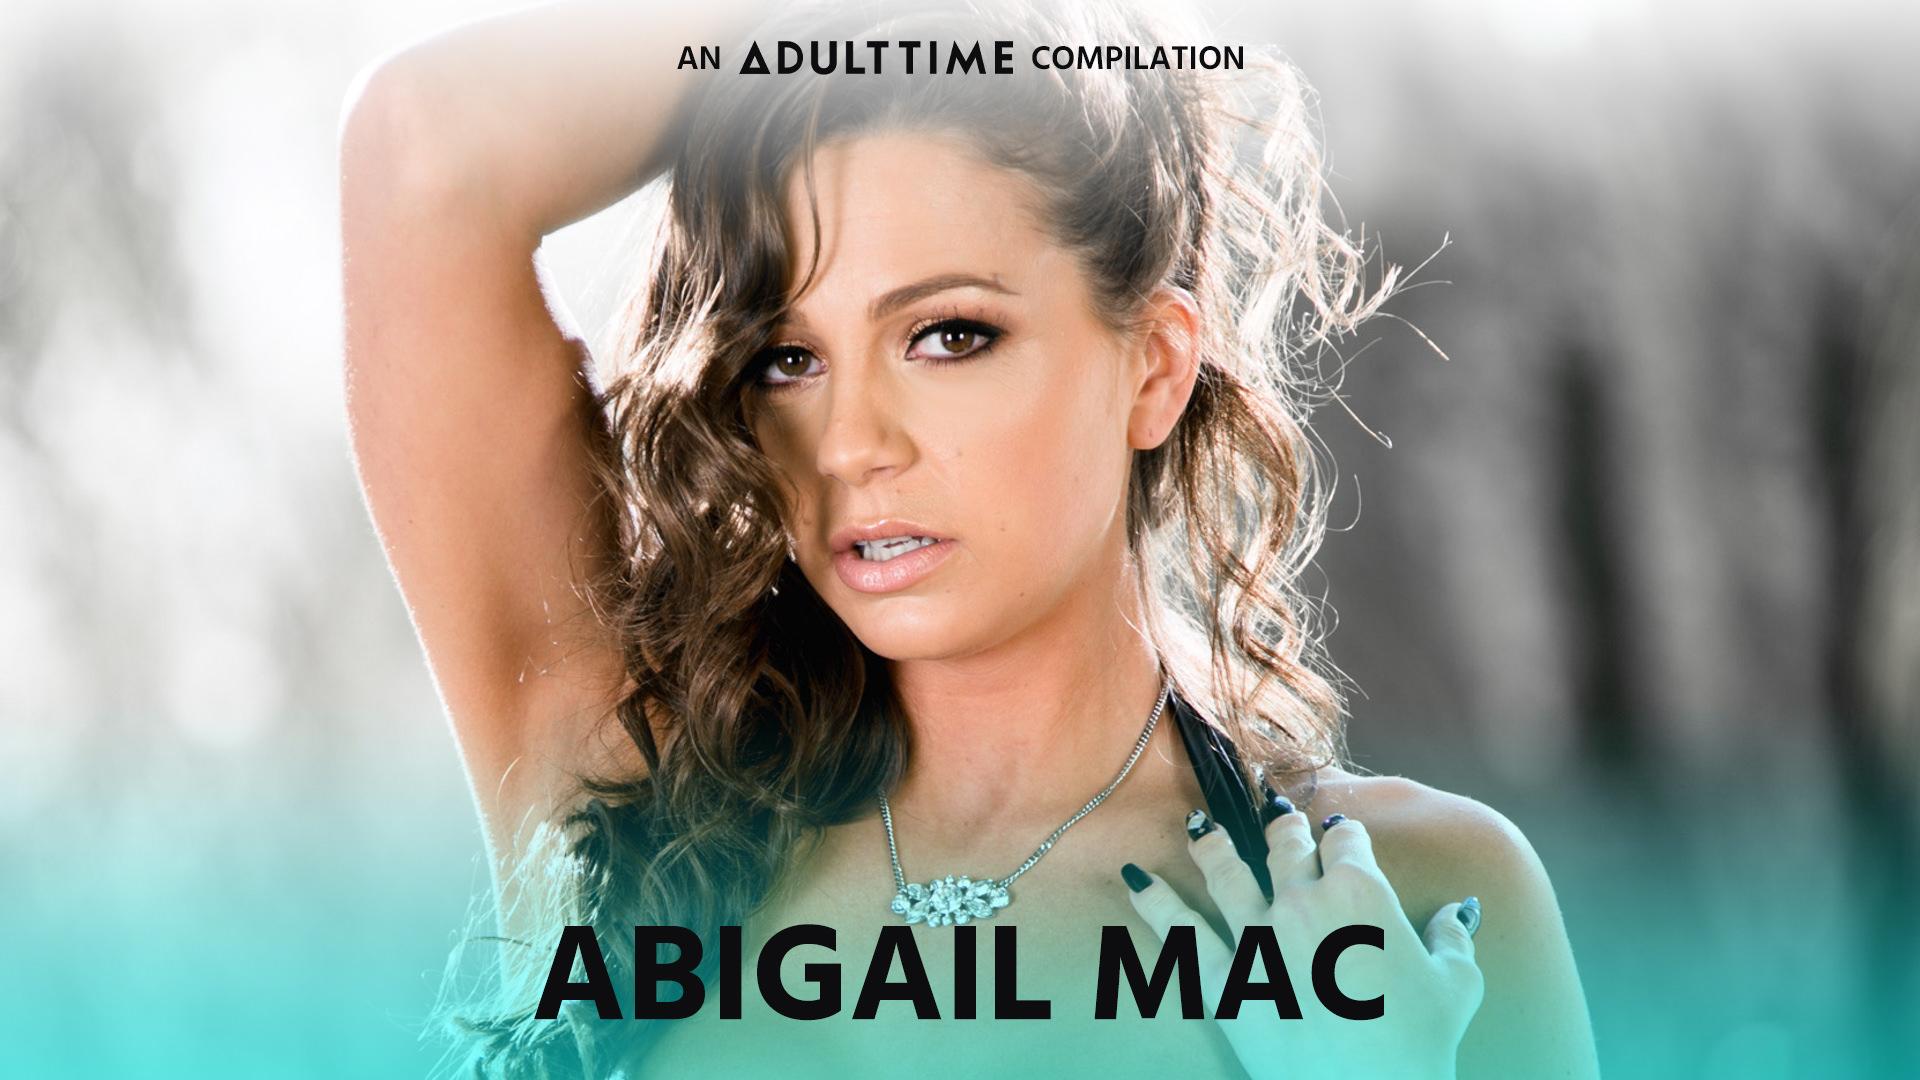 Abigail Mac - An Adult Time Compilation - Abigail Mac 1